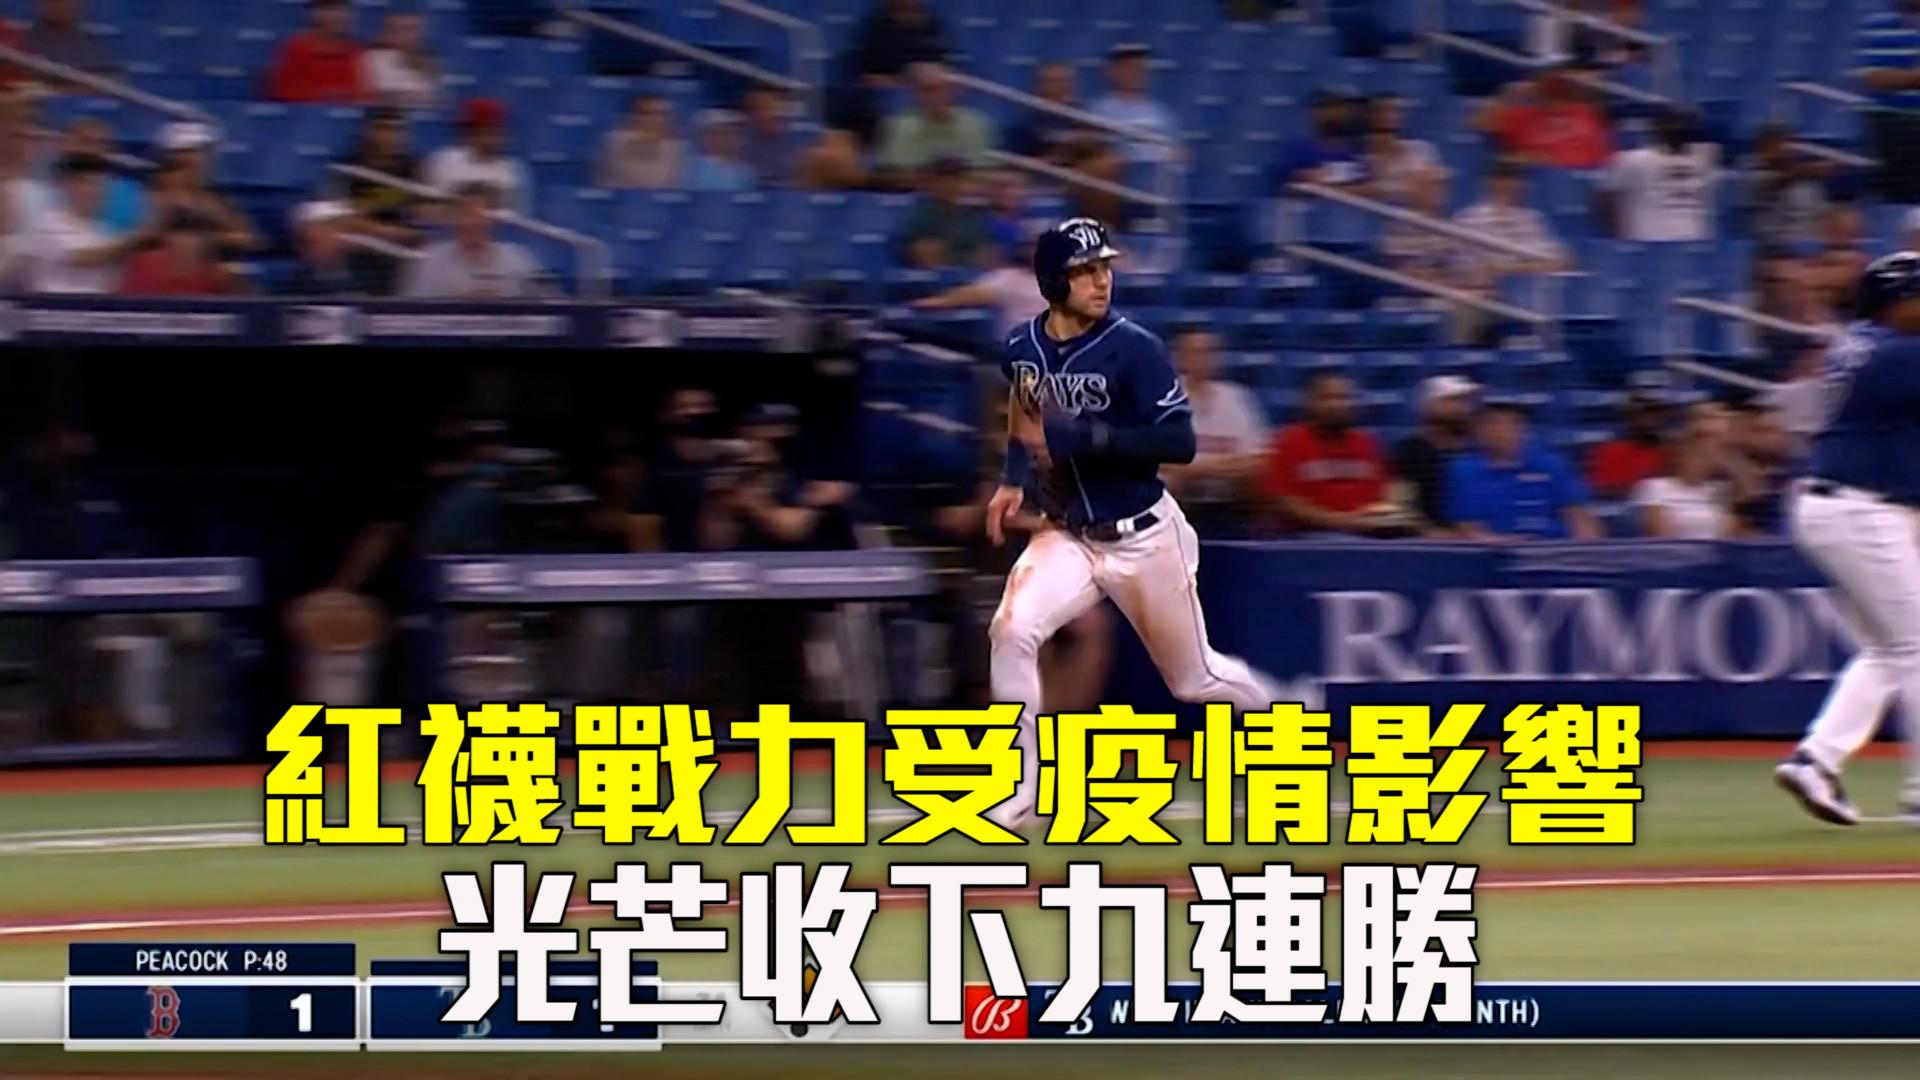 【MLB看愛爾達】紅襪戰力受疫情影響 光芒收下九連勝 09/01